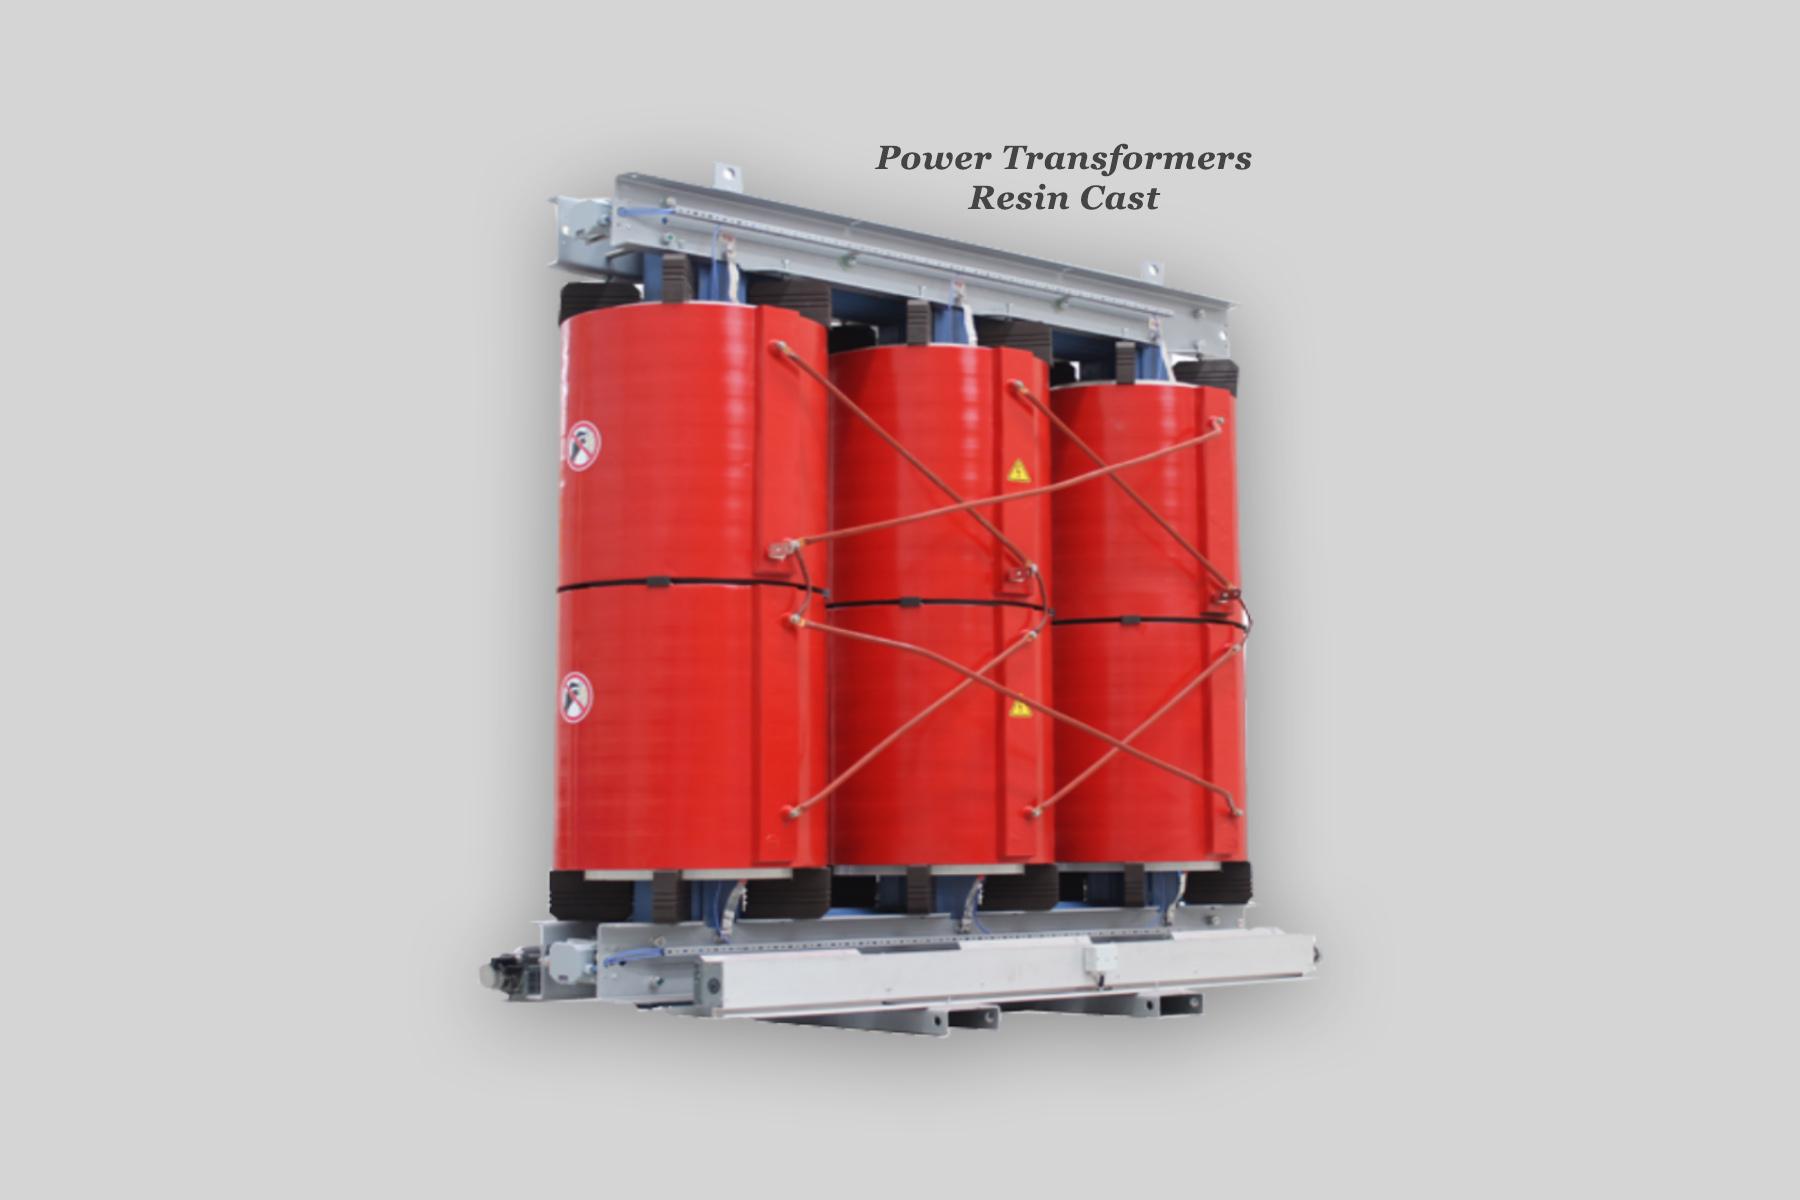 Power Transformer Resin Cast